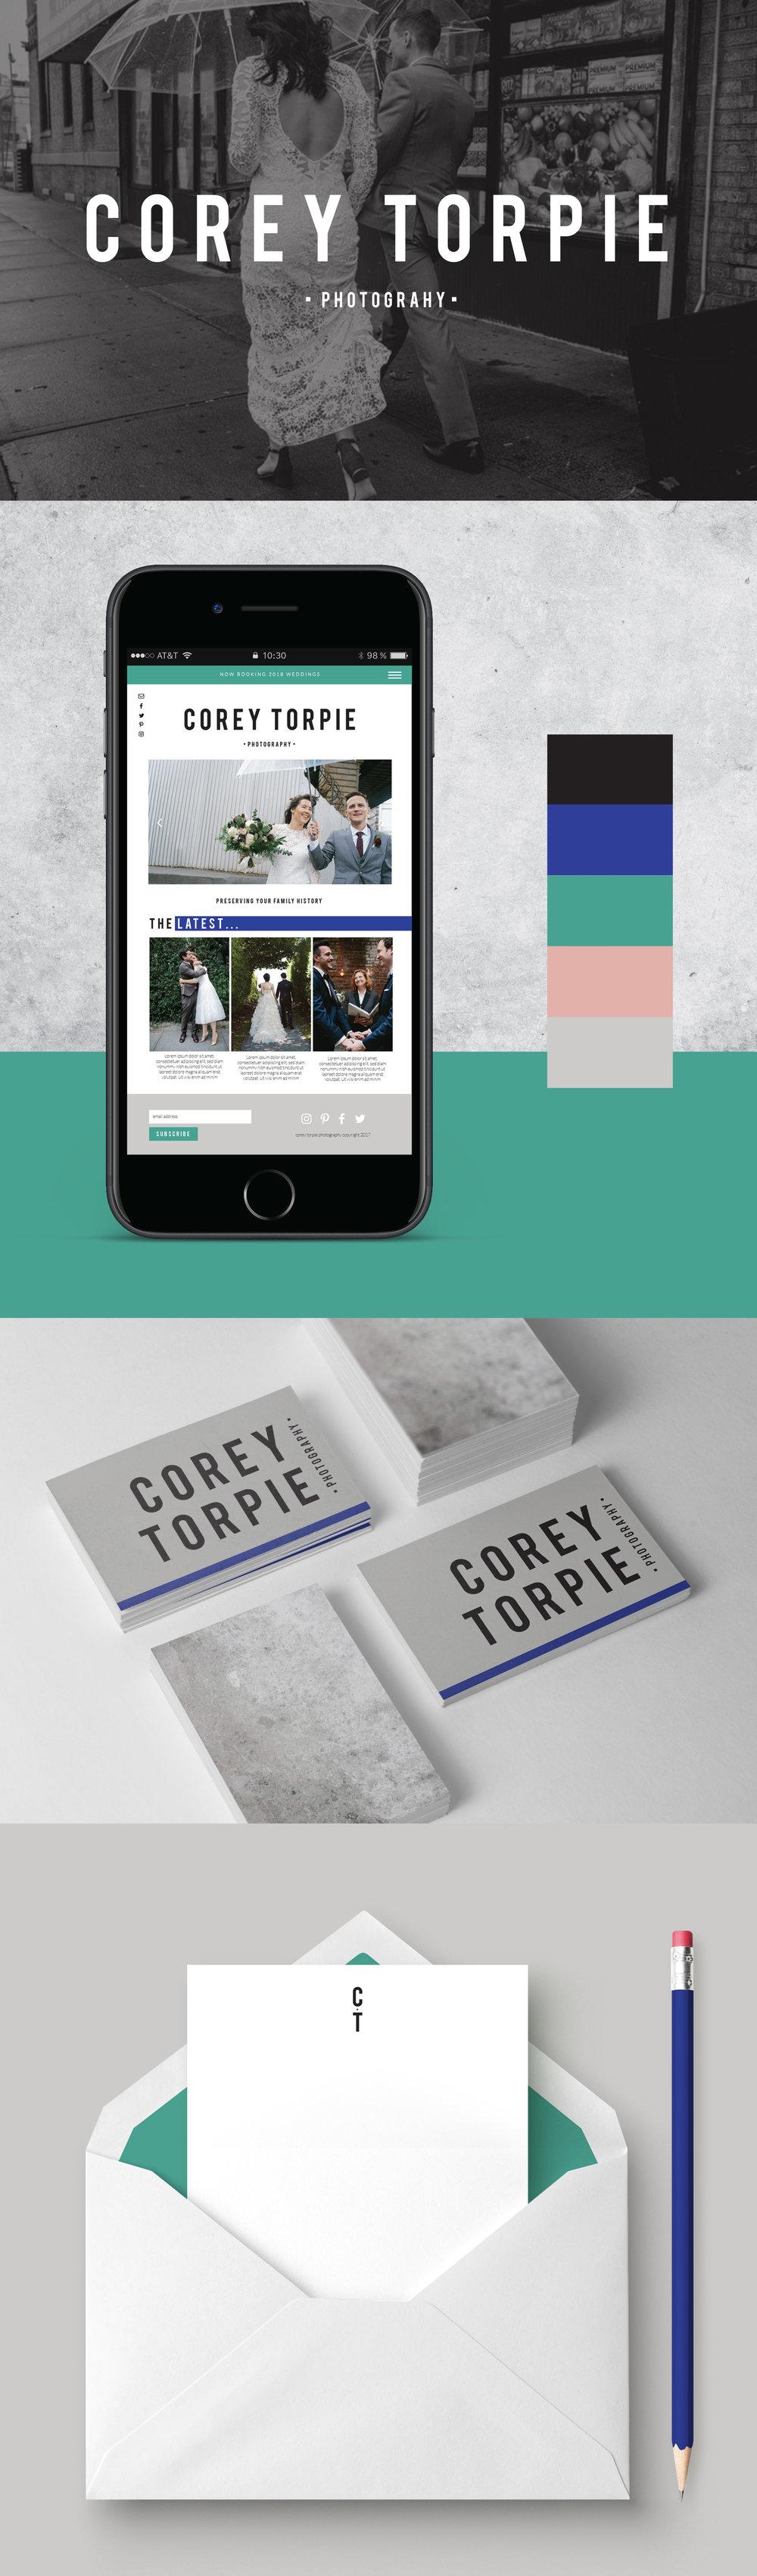 Corey-Torpie-Branding-Development.jpg